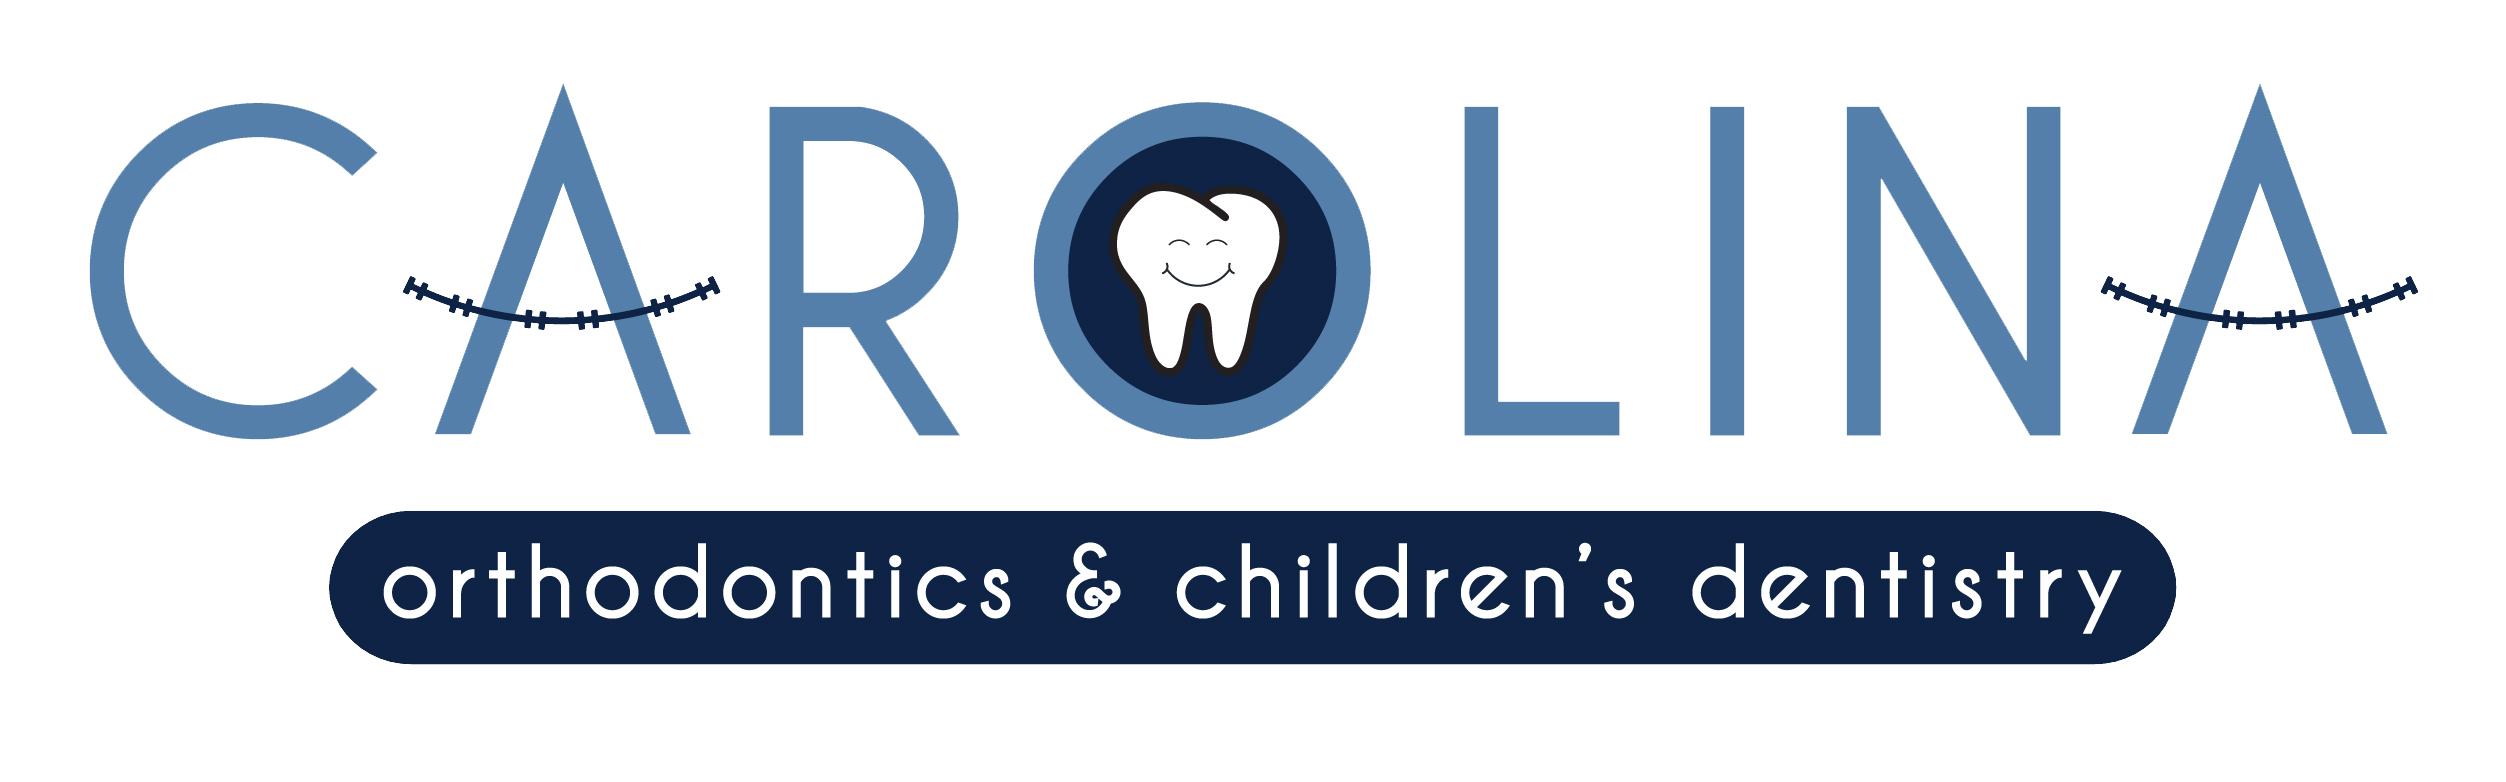 Sponsor Carolina Orthodontics and Children's Dentistry